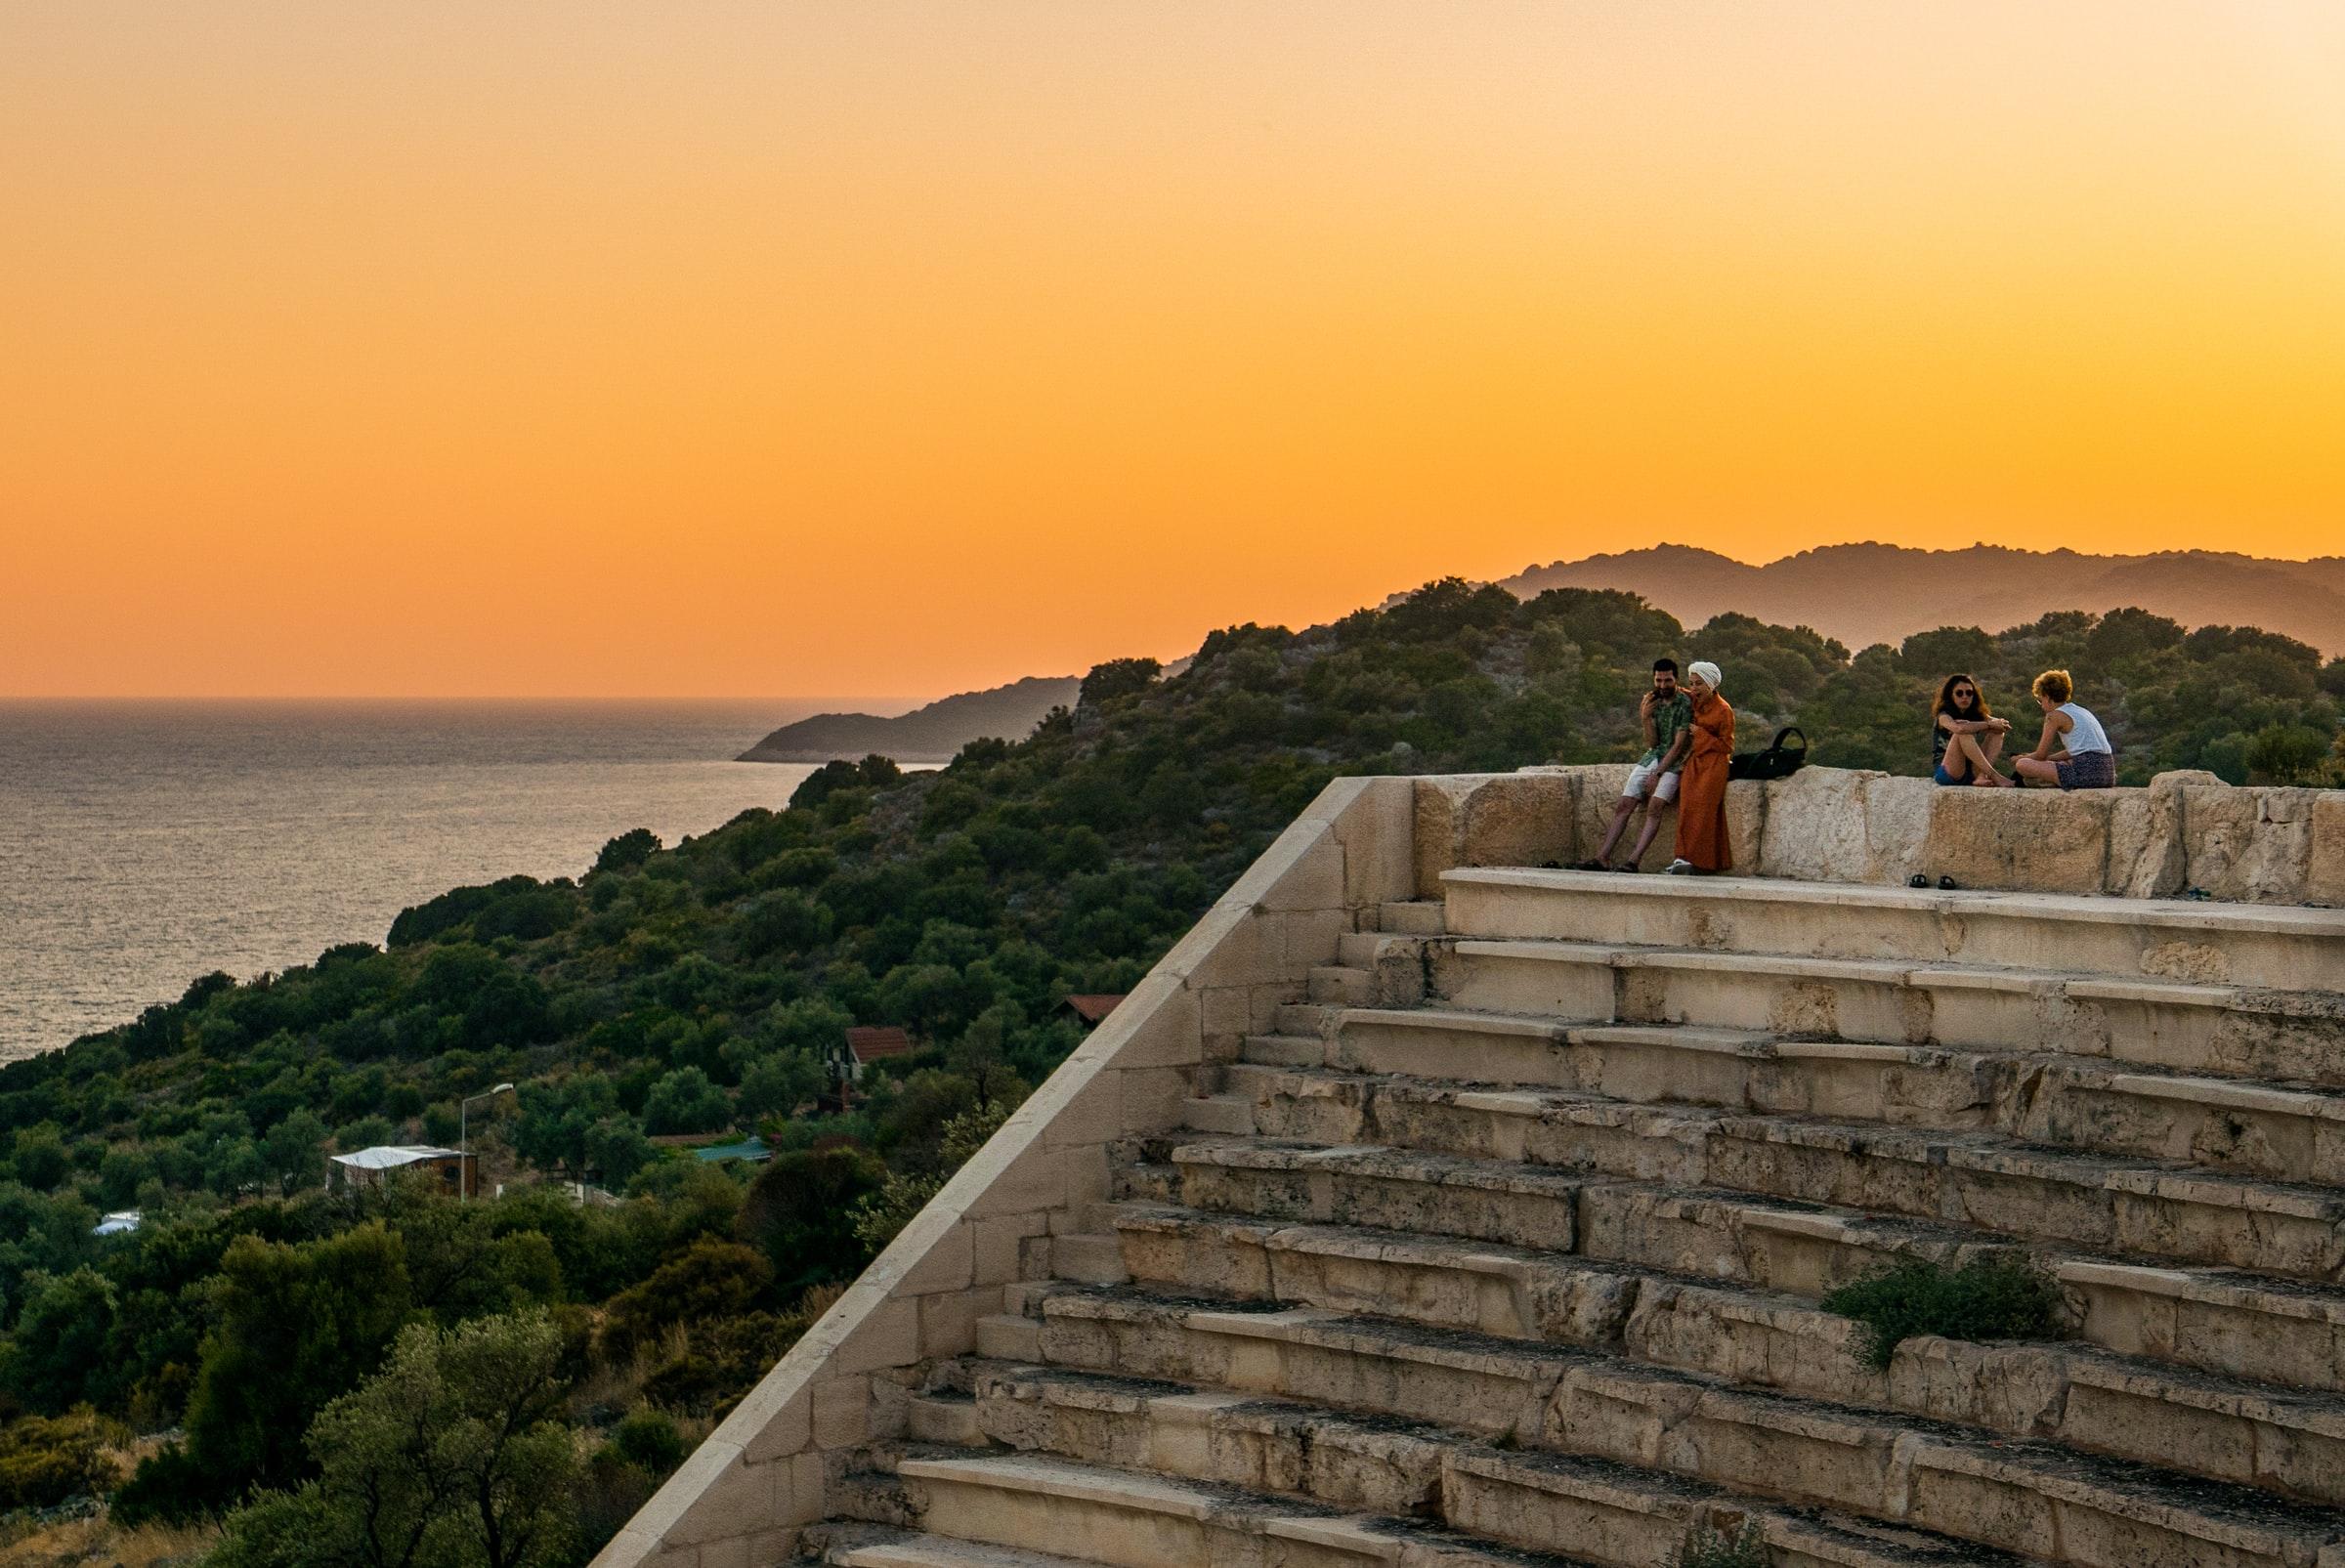 Türkei Kas - Sonnenuntergang, Landschaft, große Treppe